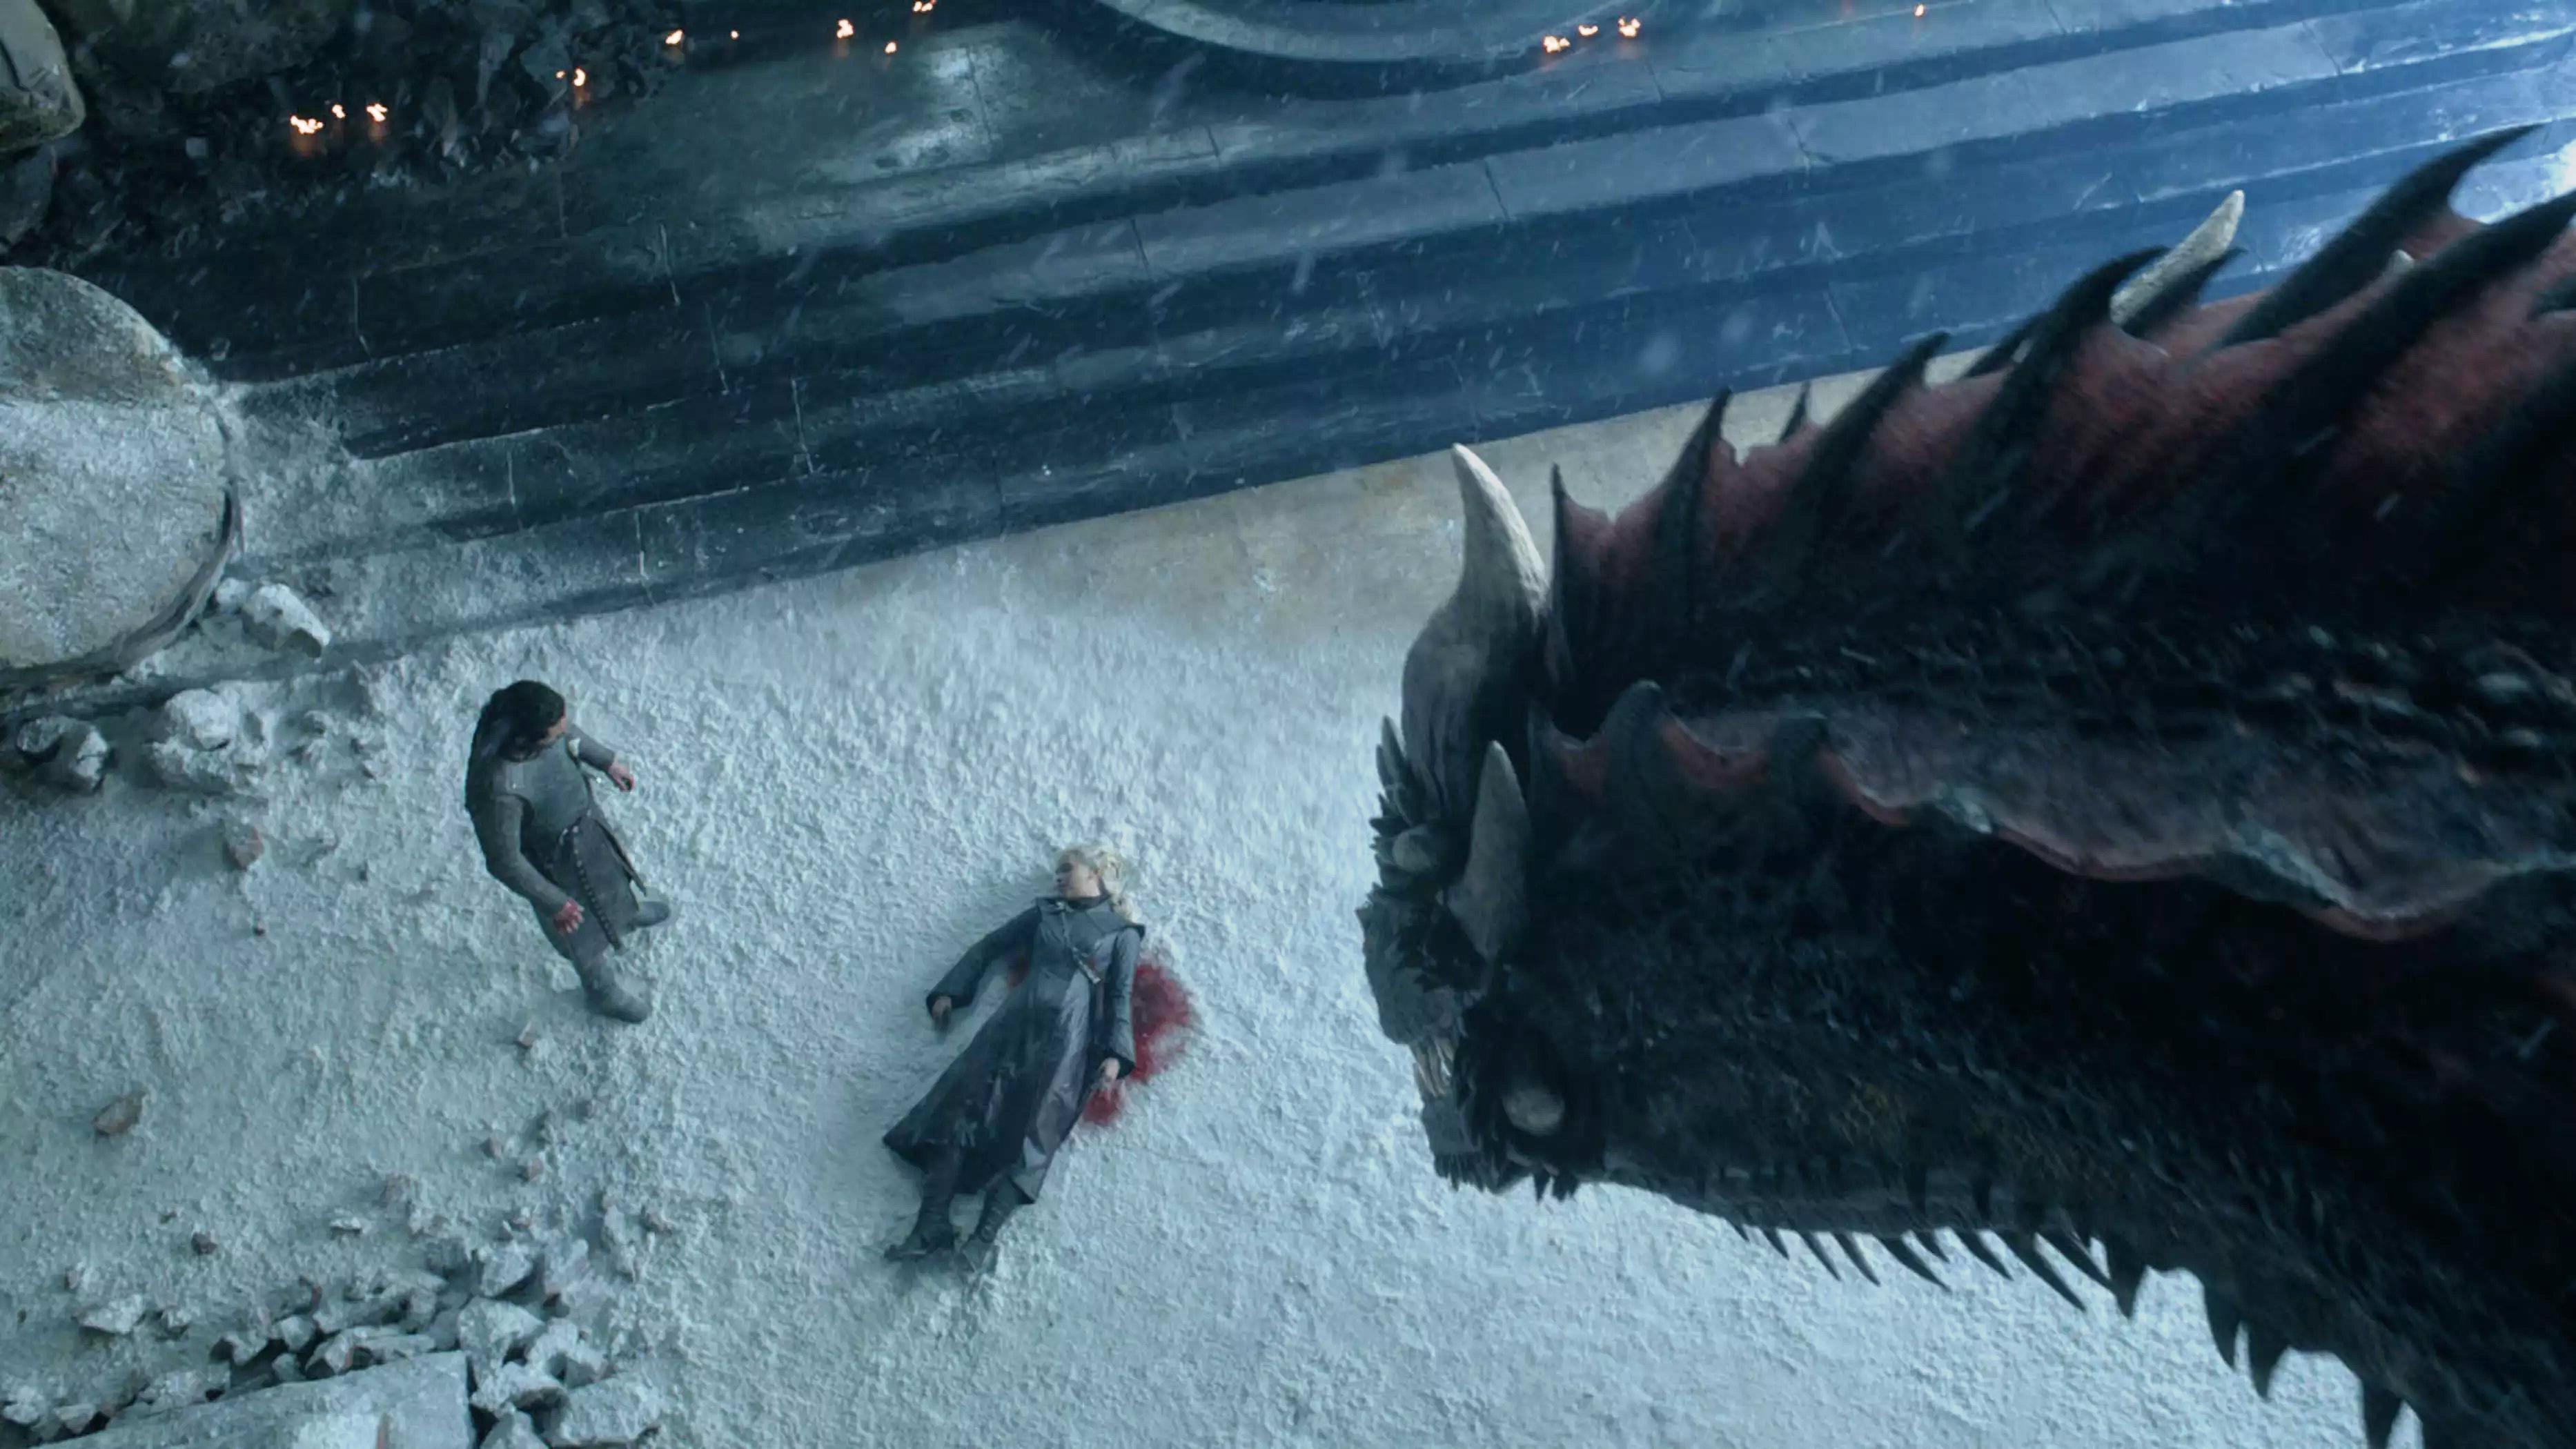 8x06 - The Iron Throne - Jon, Daenerys and Drogon